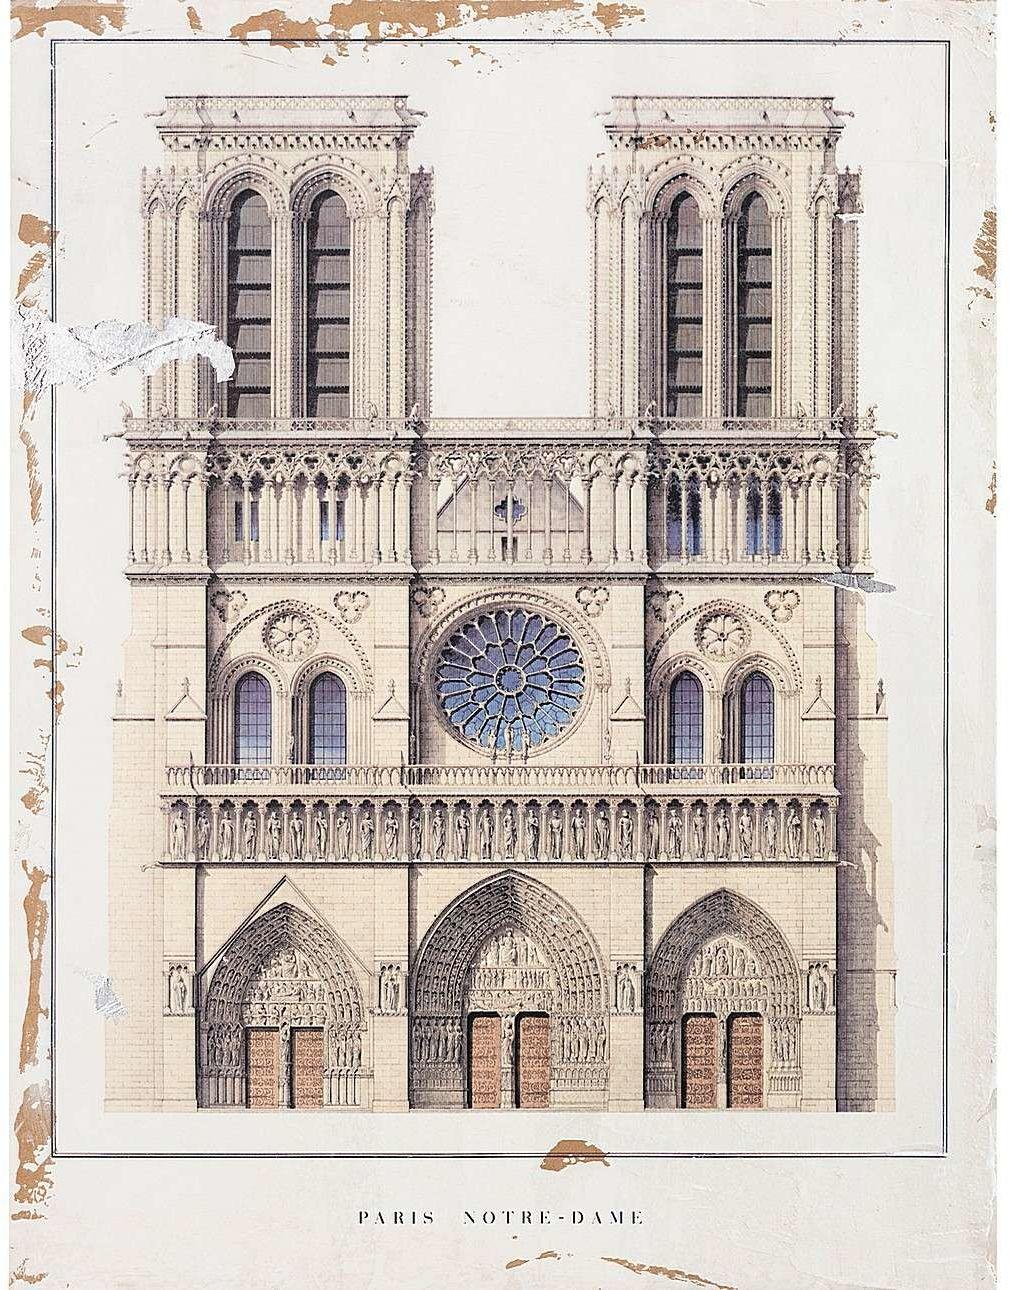 Obraz na drewnie Notre Dame 60x80cm, 60 x 4 x 80 cm